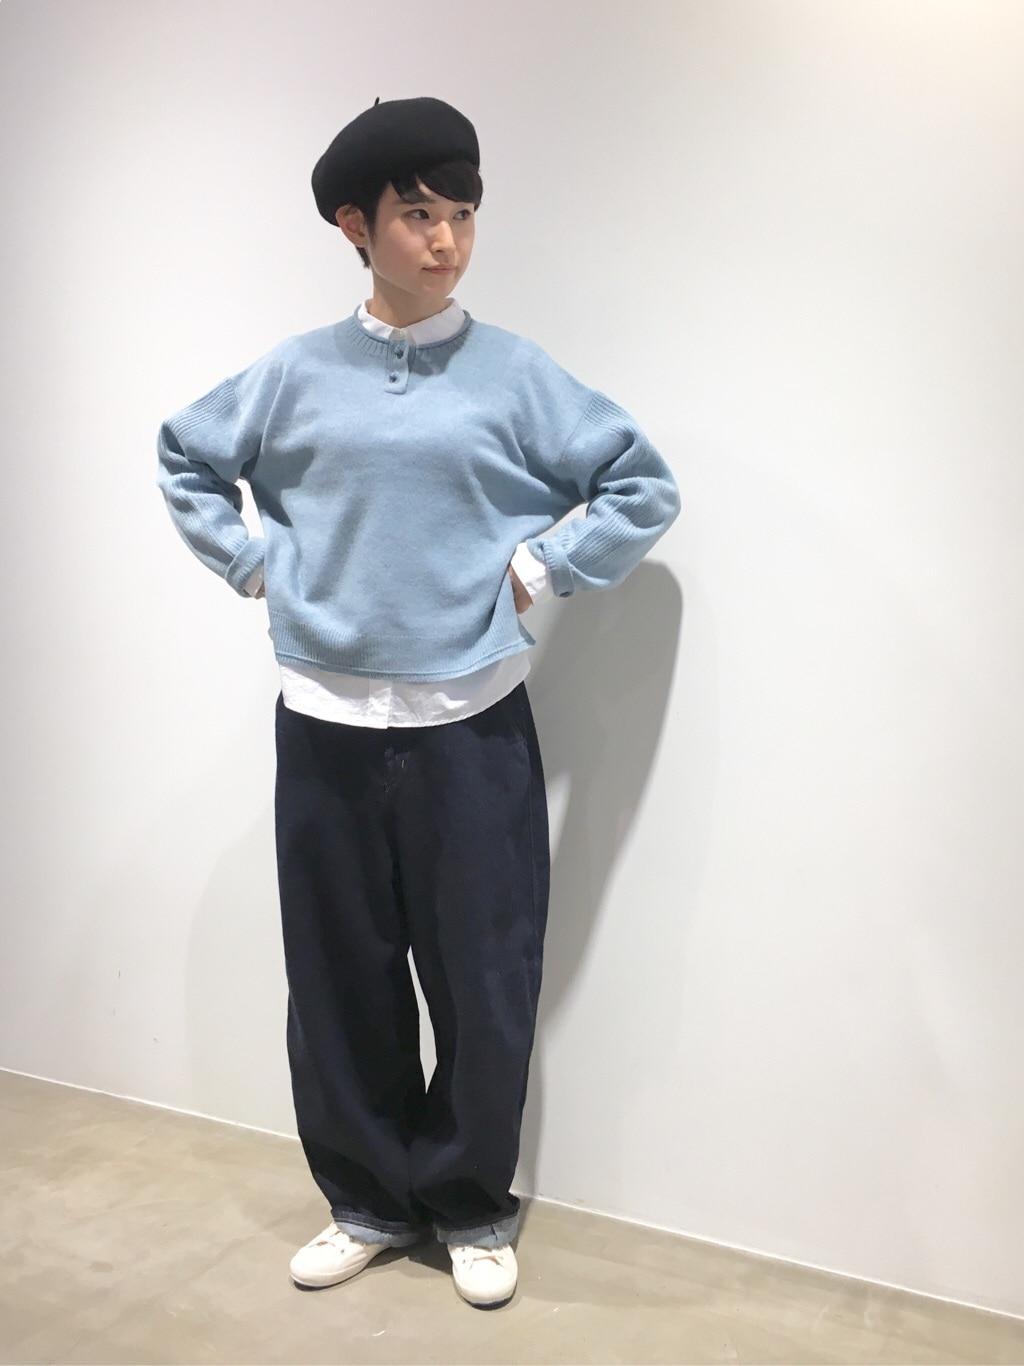 yuni / bulle de savon 京都路面 身長:159cm 2020.09.24